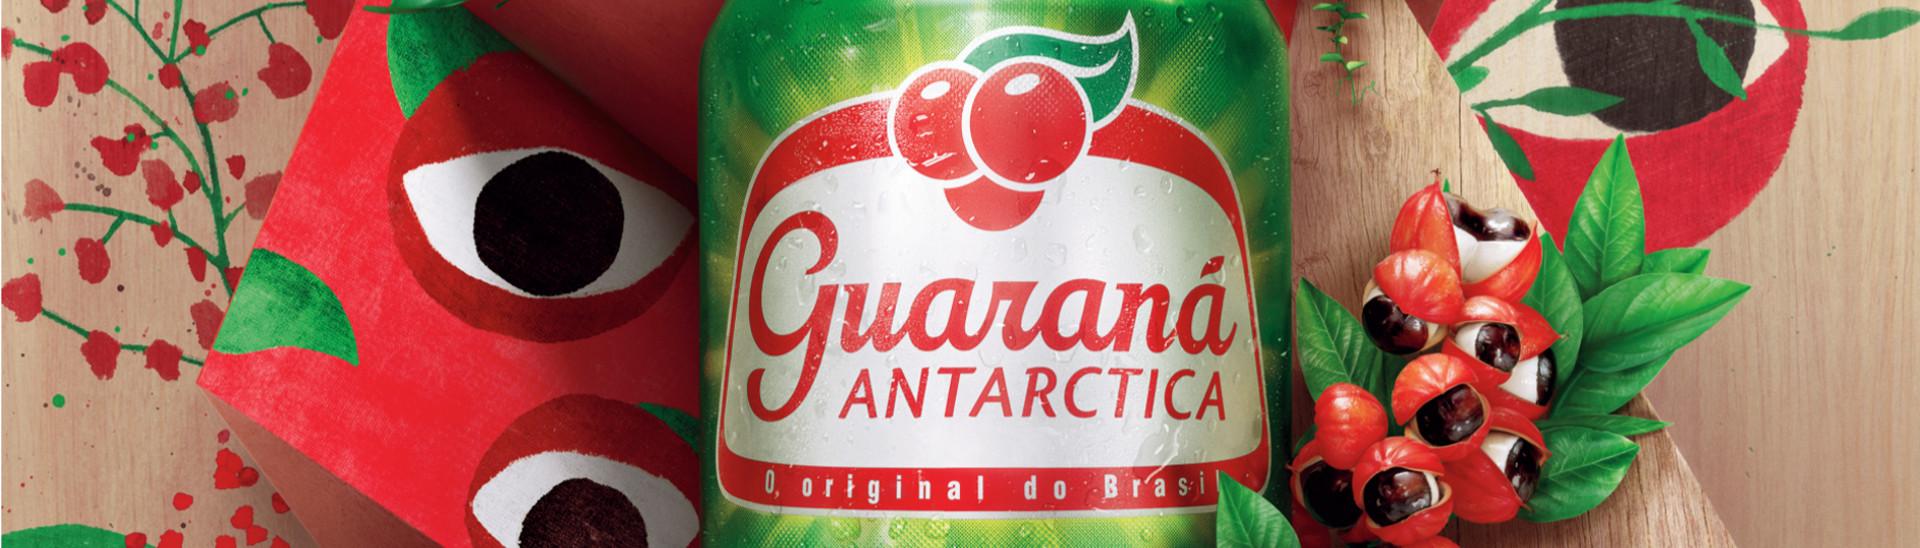 Guarana 33 B